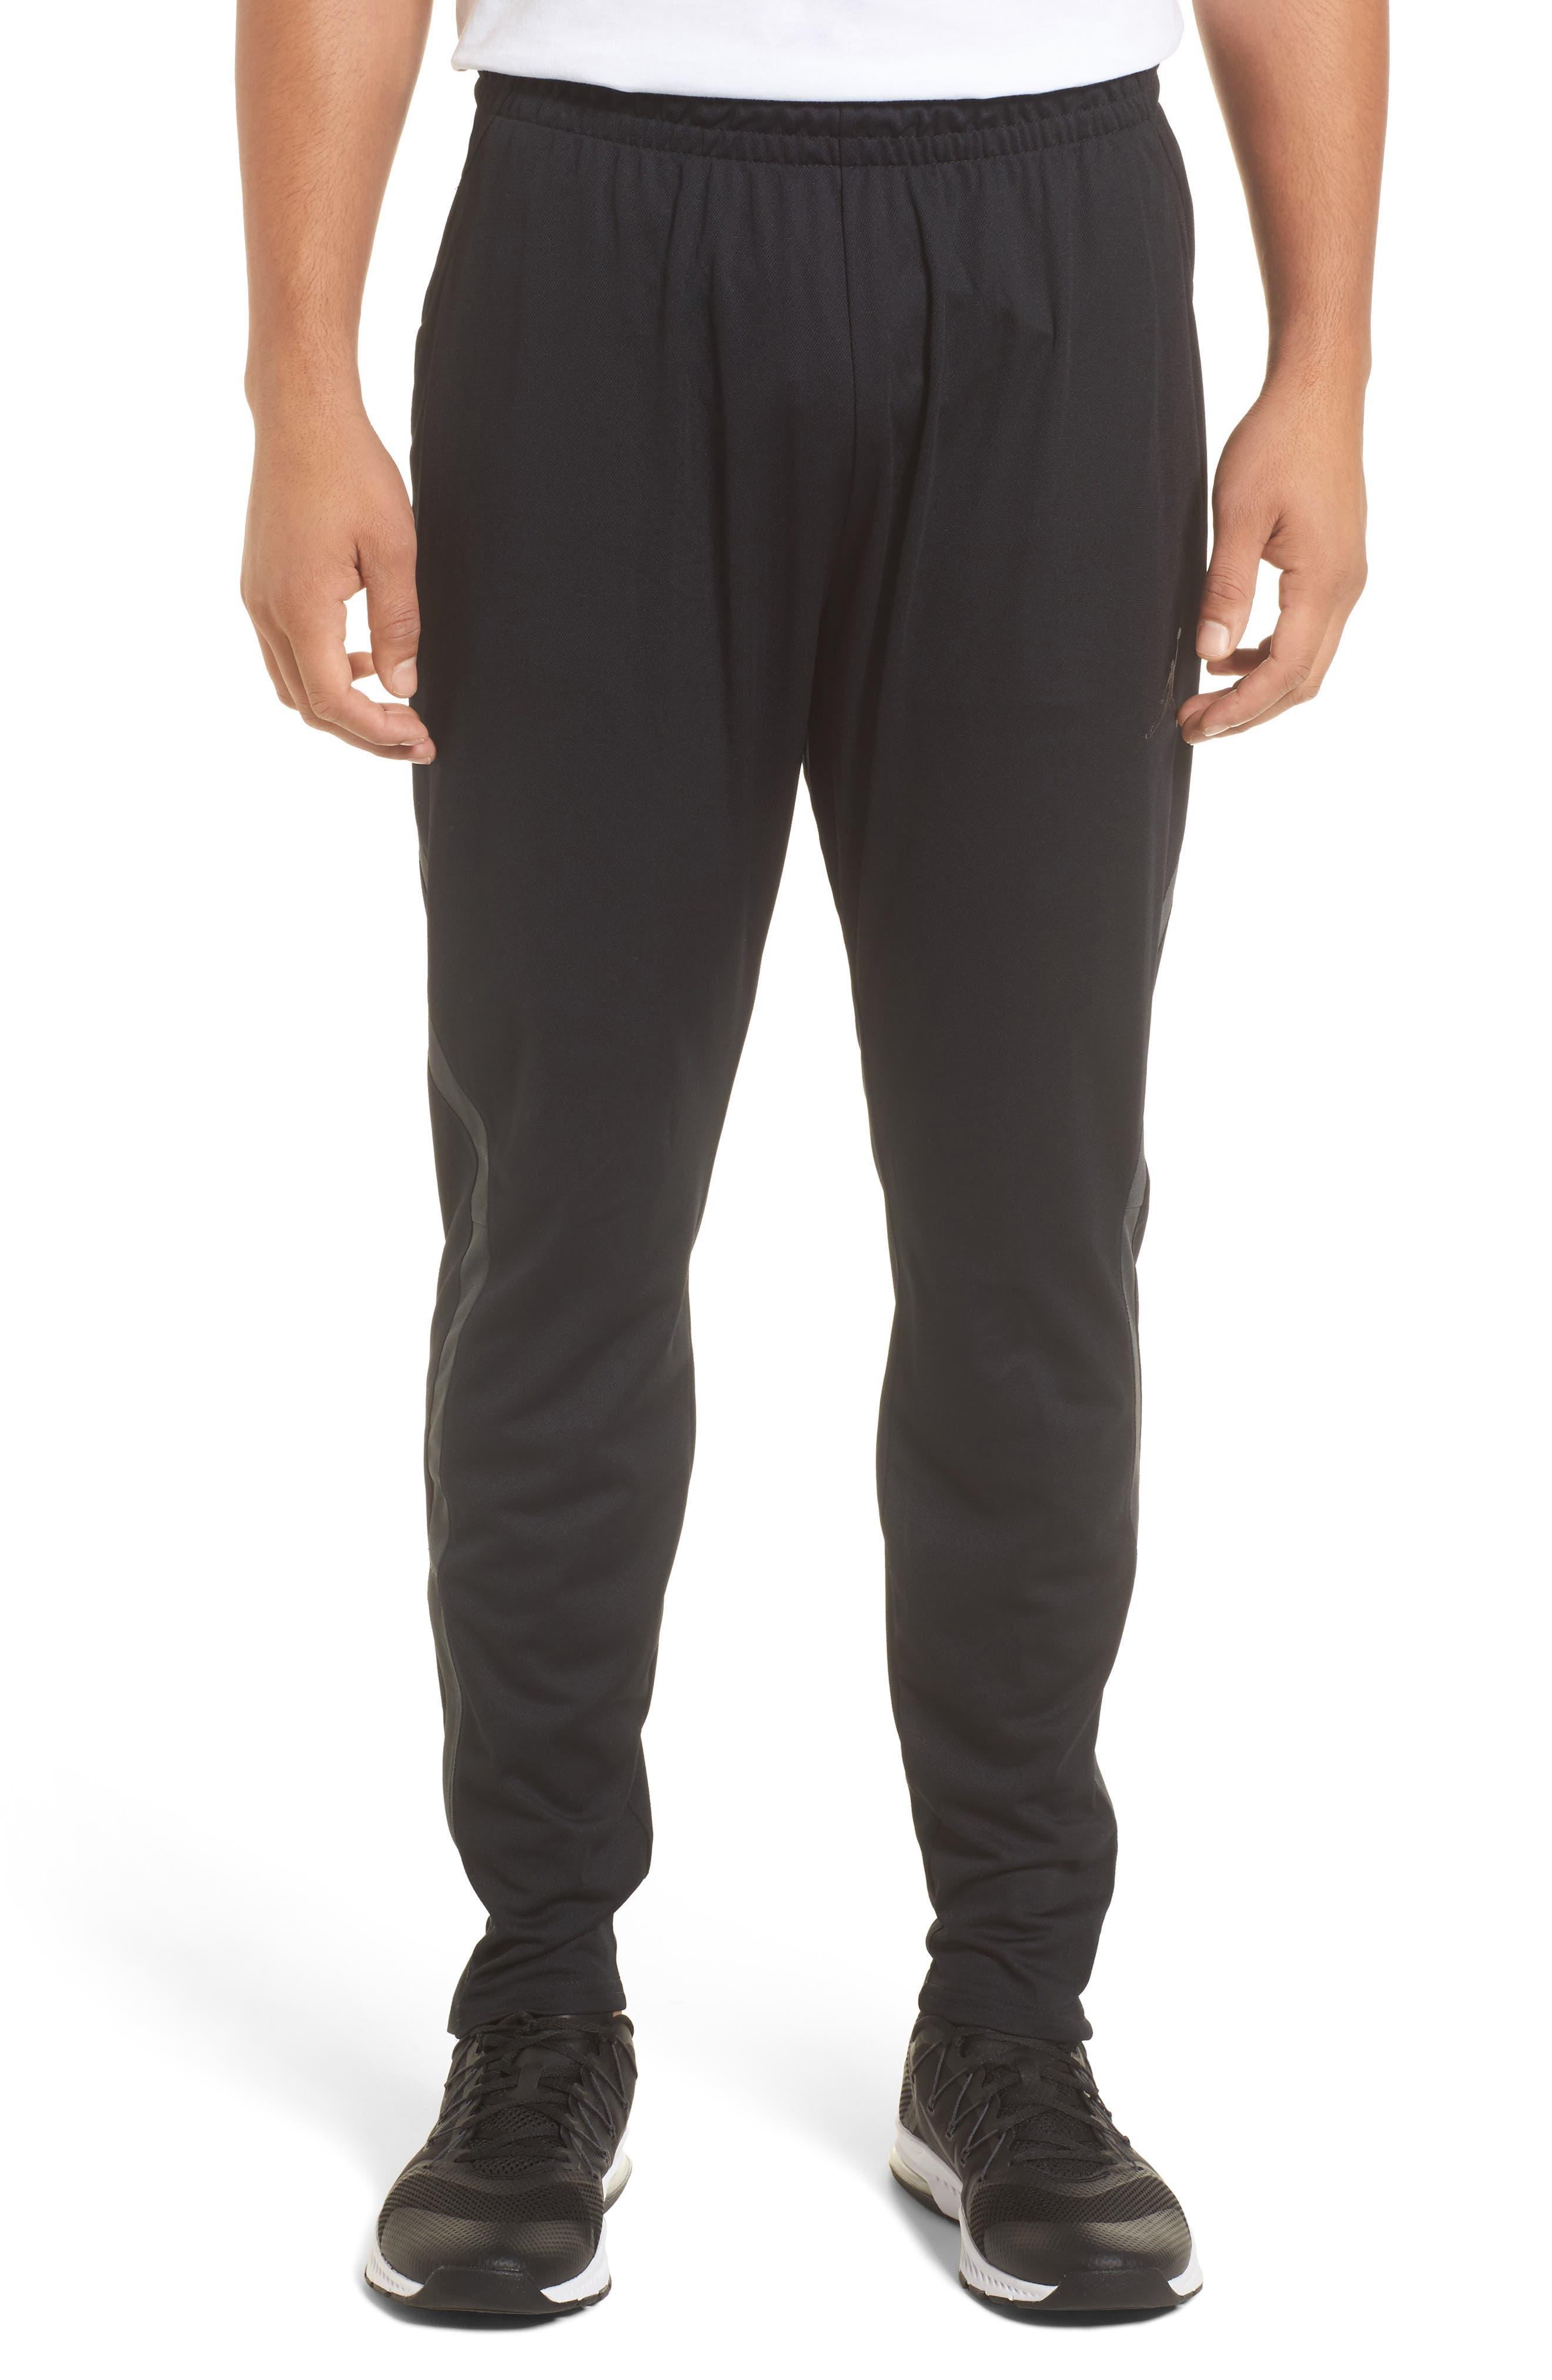 Dry 23 Alpha Pants,                             Main thumbnail 1, color,                             010